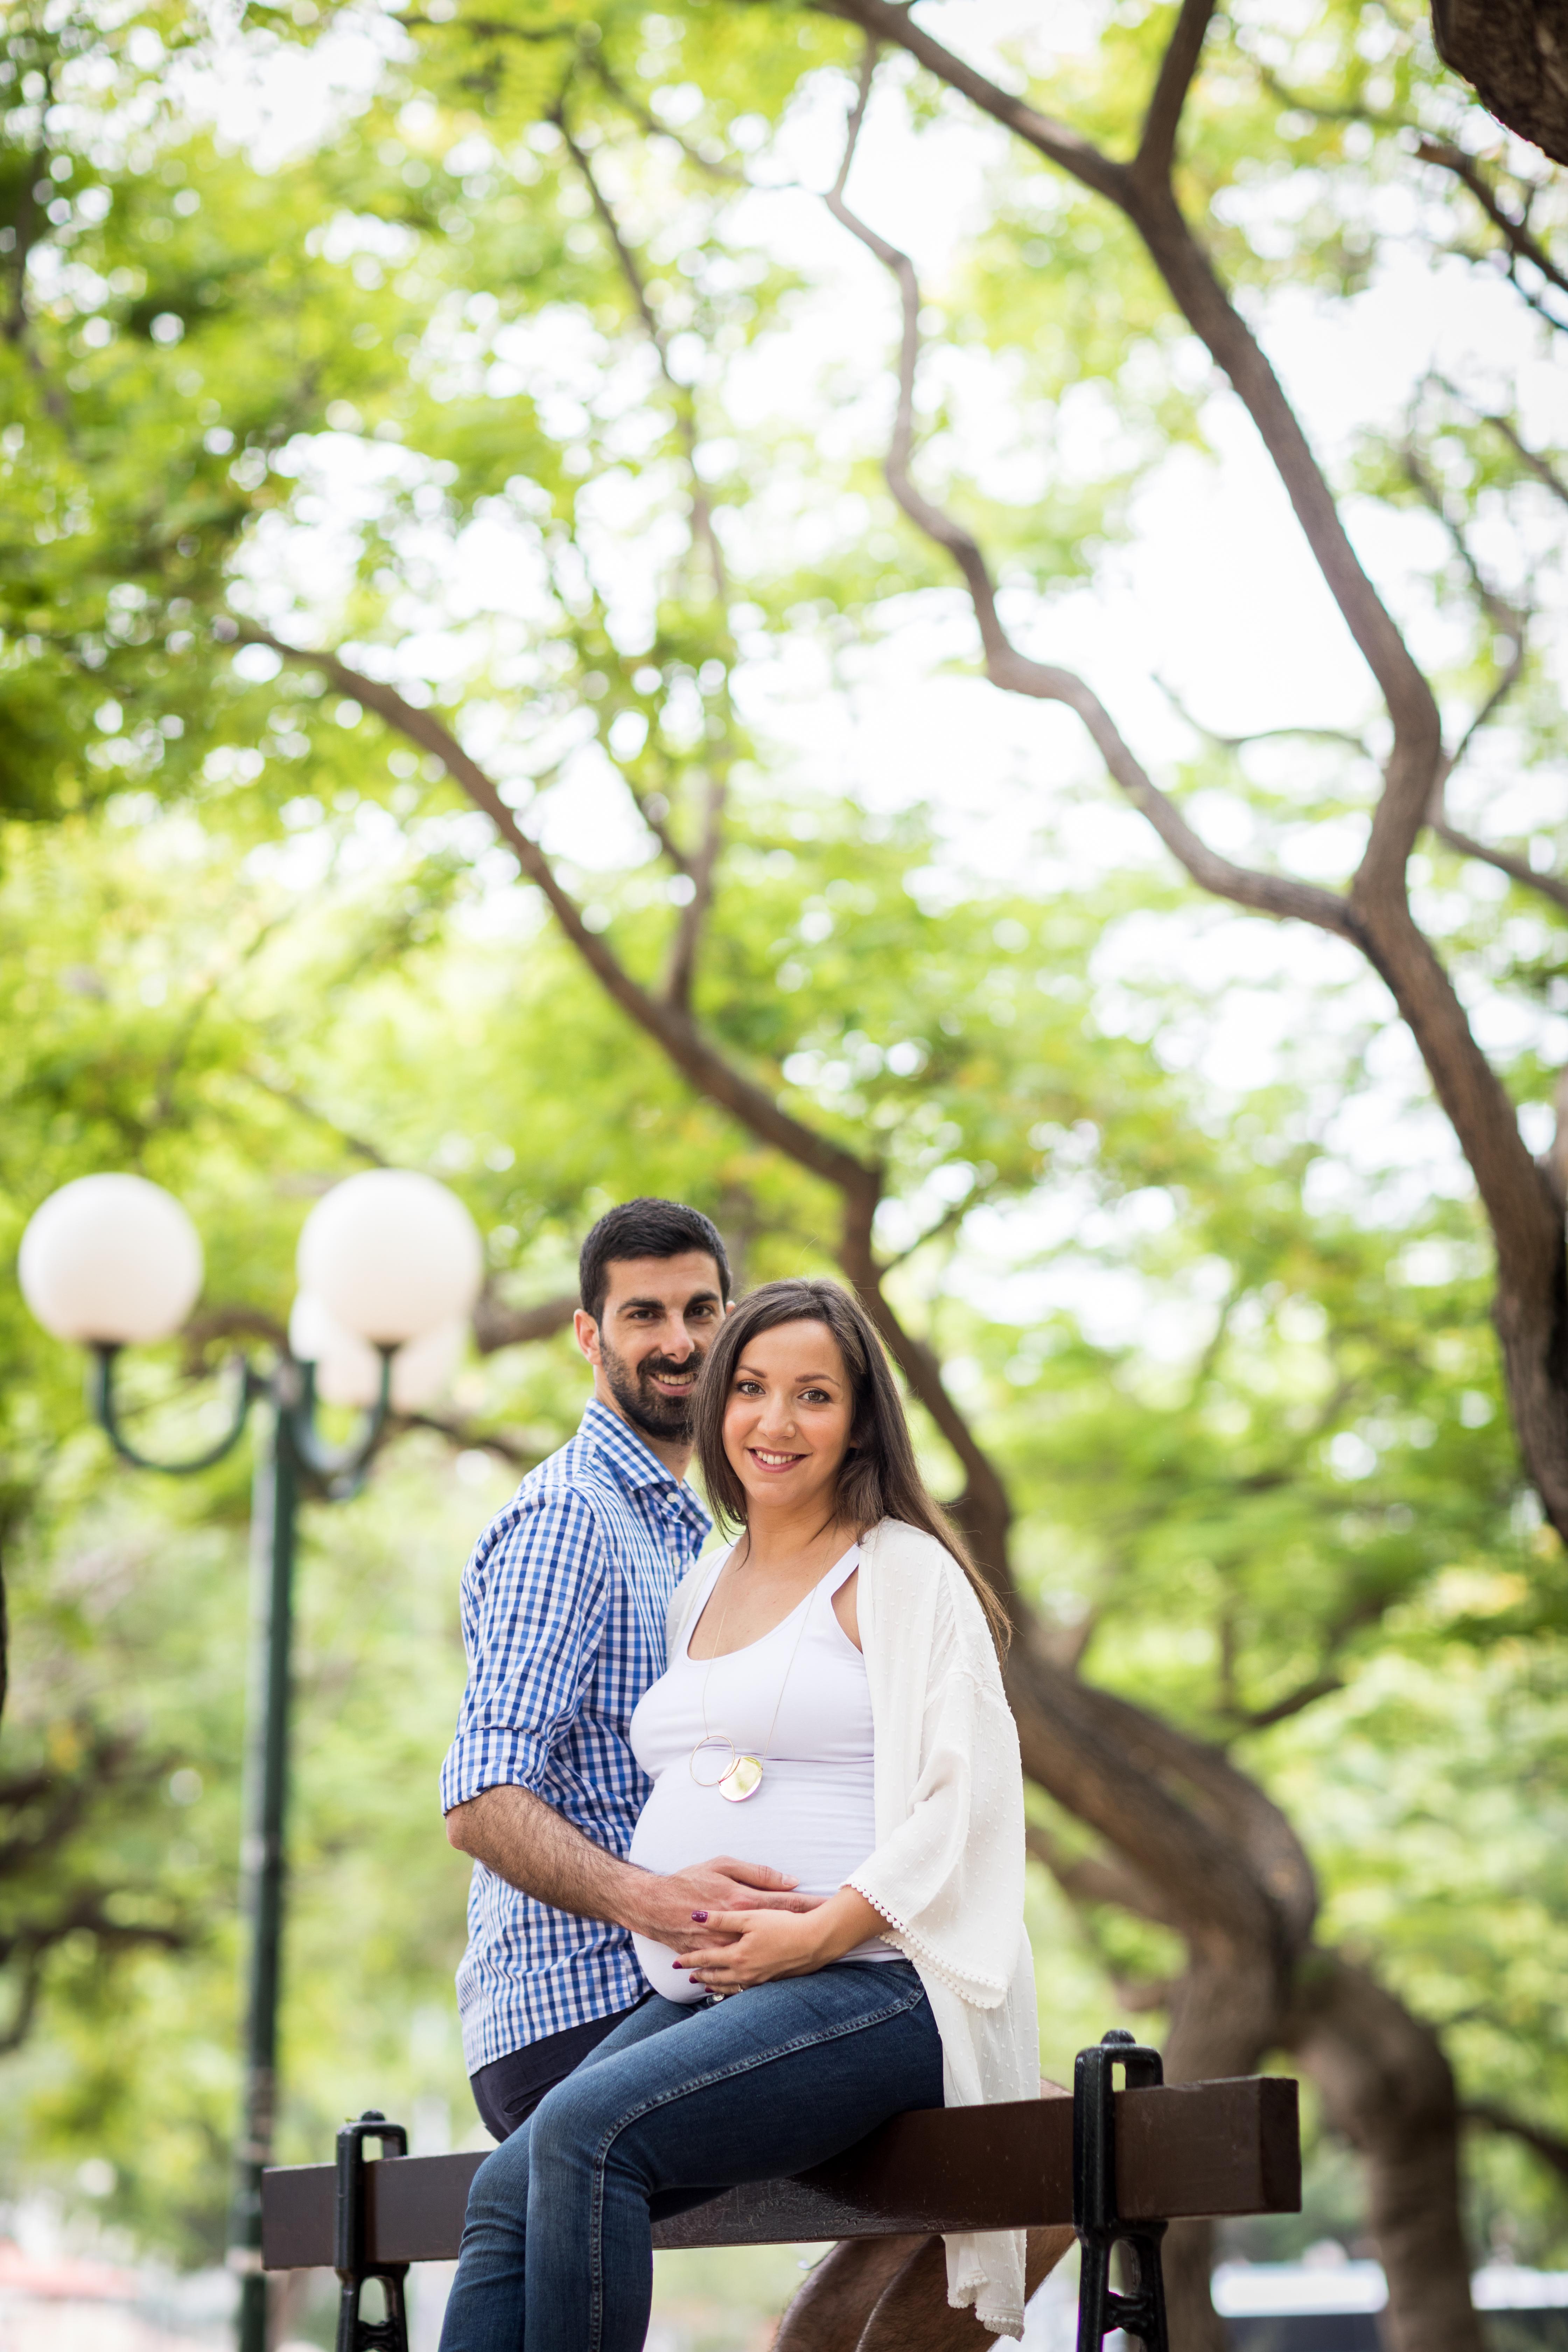 Judit&Lior Maternity 2018.05.04